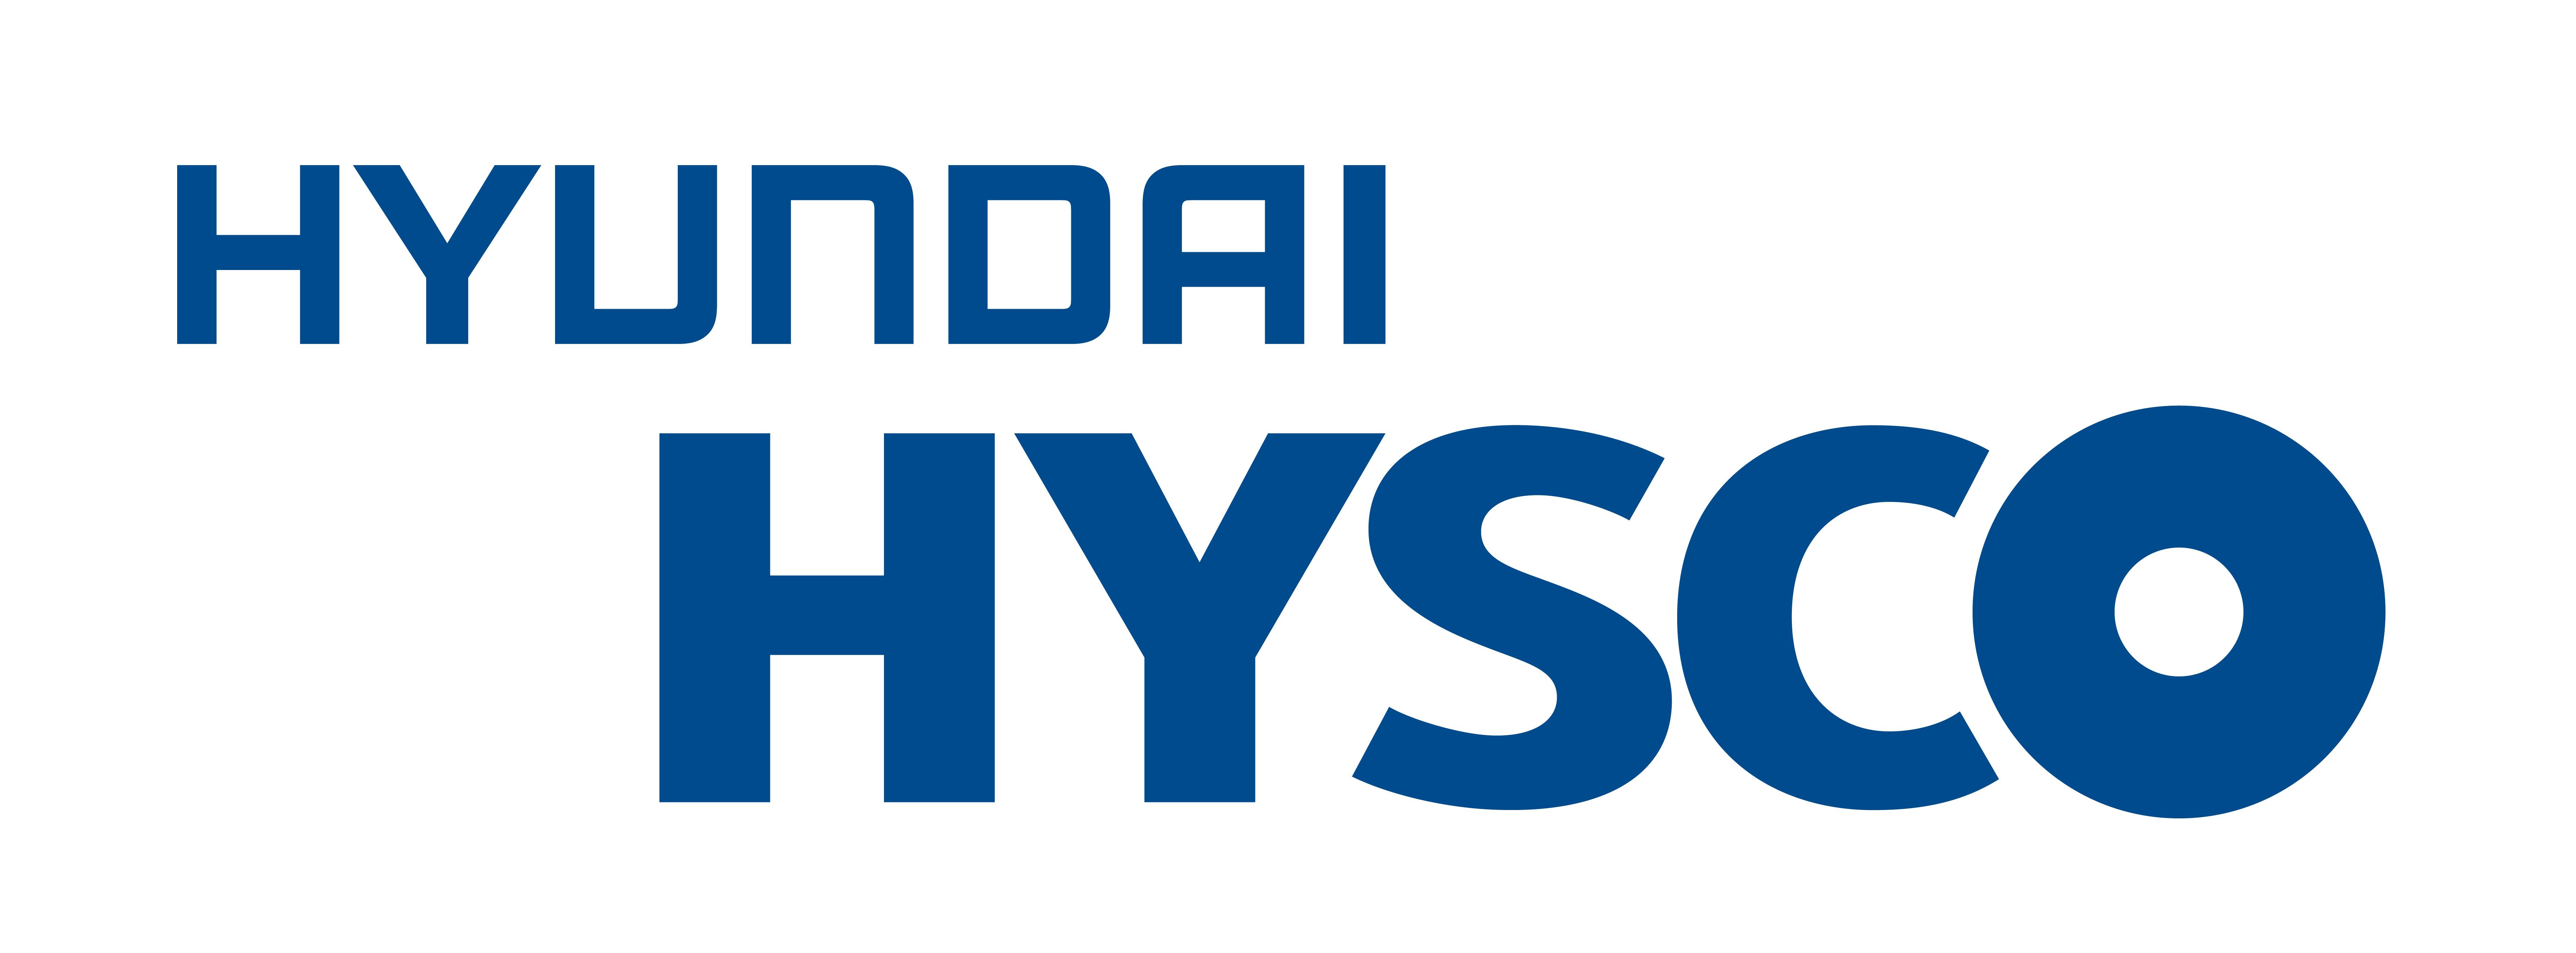 Used Cars Louisville Ky >> Hyundai Logo | Joy Studio Design Gallery - Best Design